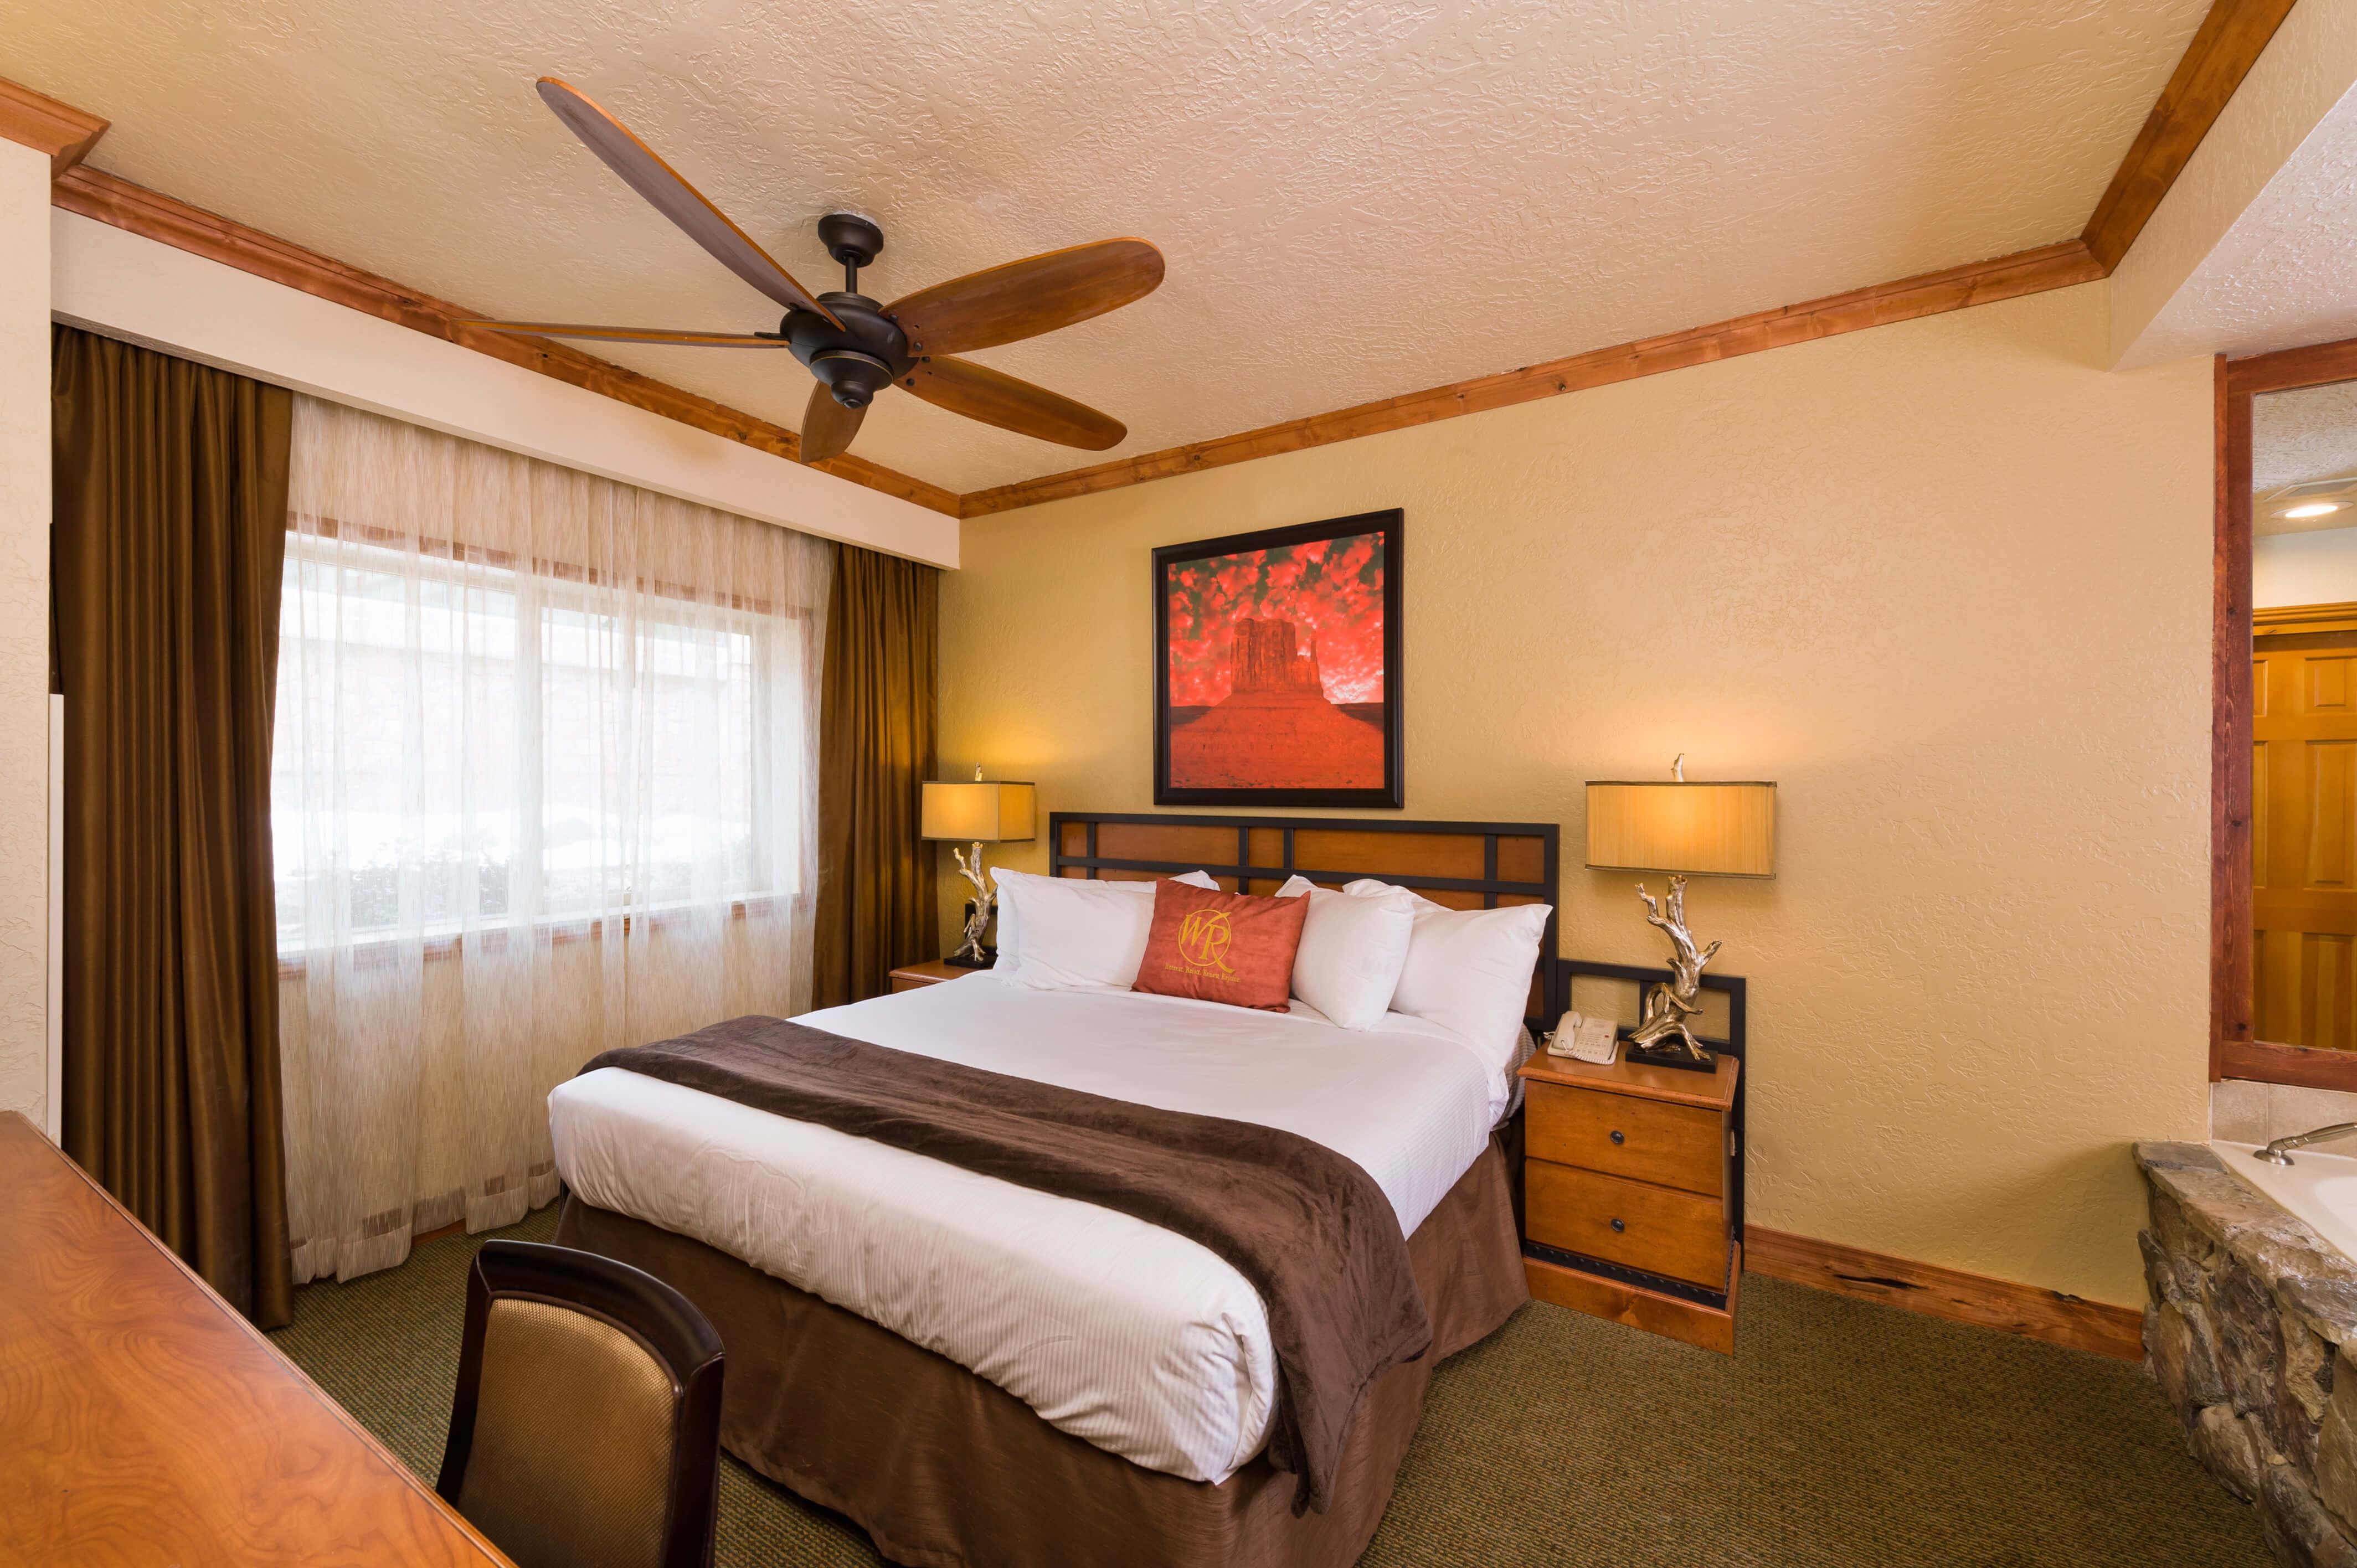 Signature One-Bedroom Villa Bedroom at our Park City Skiing Resort in Utah   Westgate Park City Resort & Spa   Westgate Ski Resorts